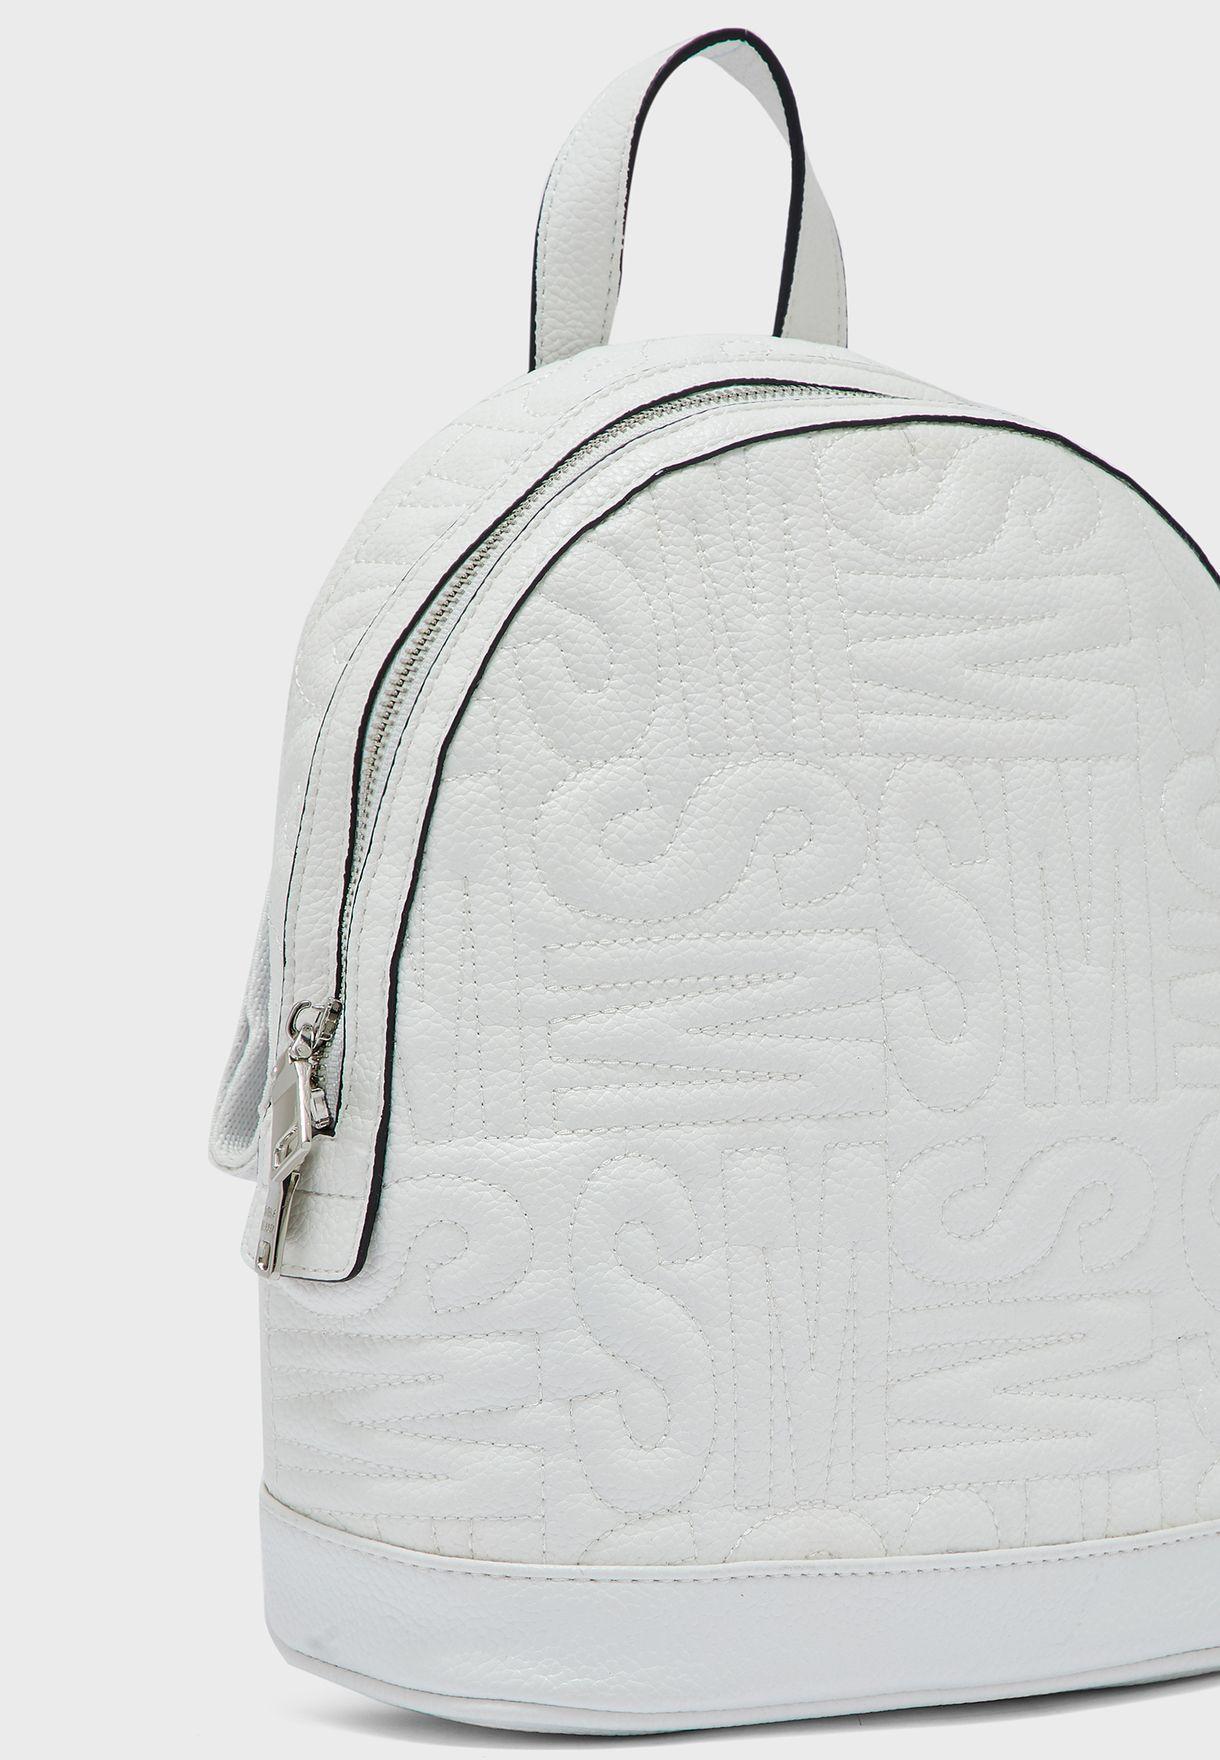 Bgale Top Handle Backpack